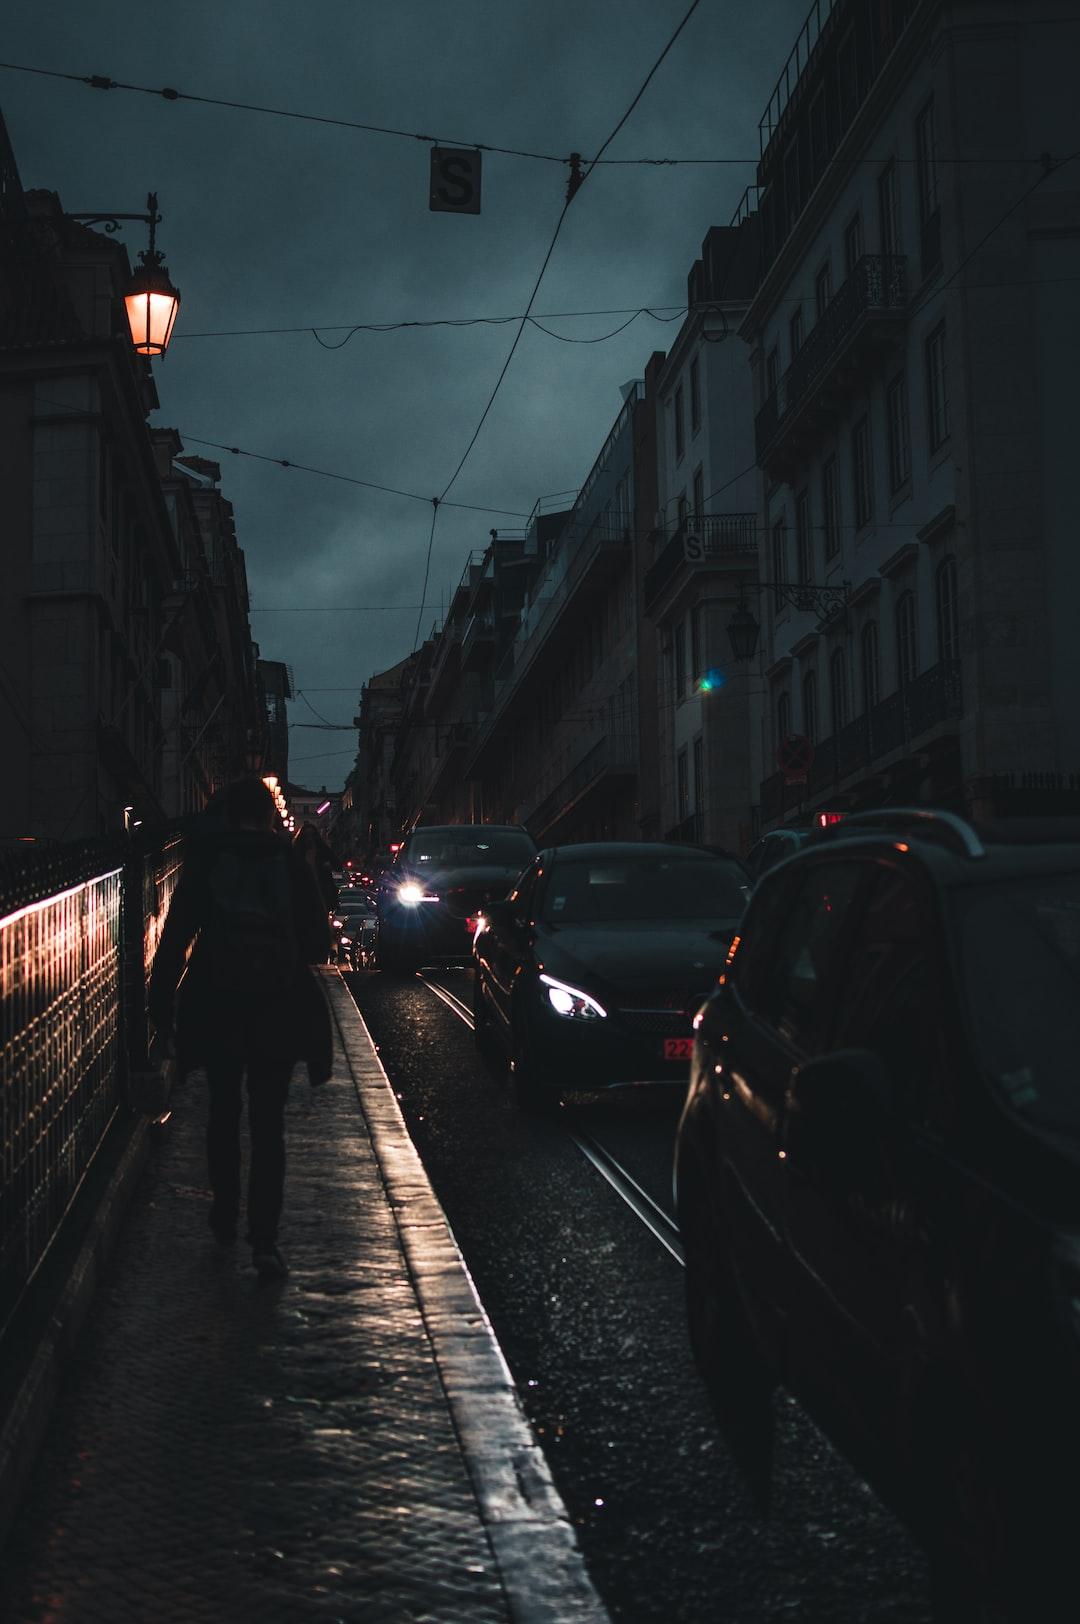 Almost night in Lisbon